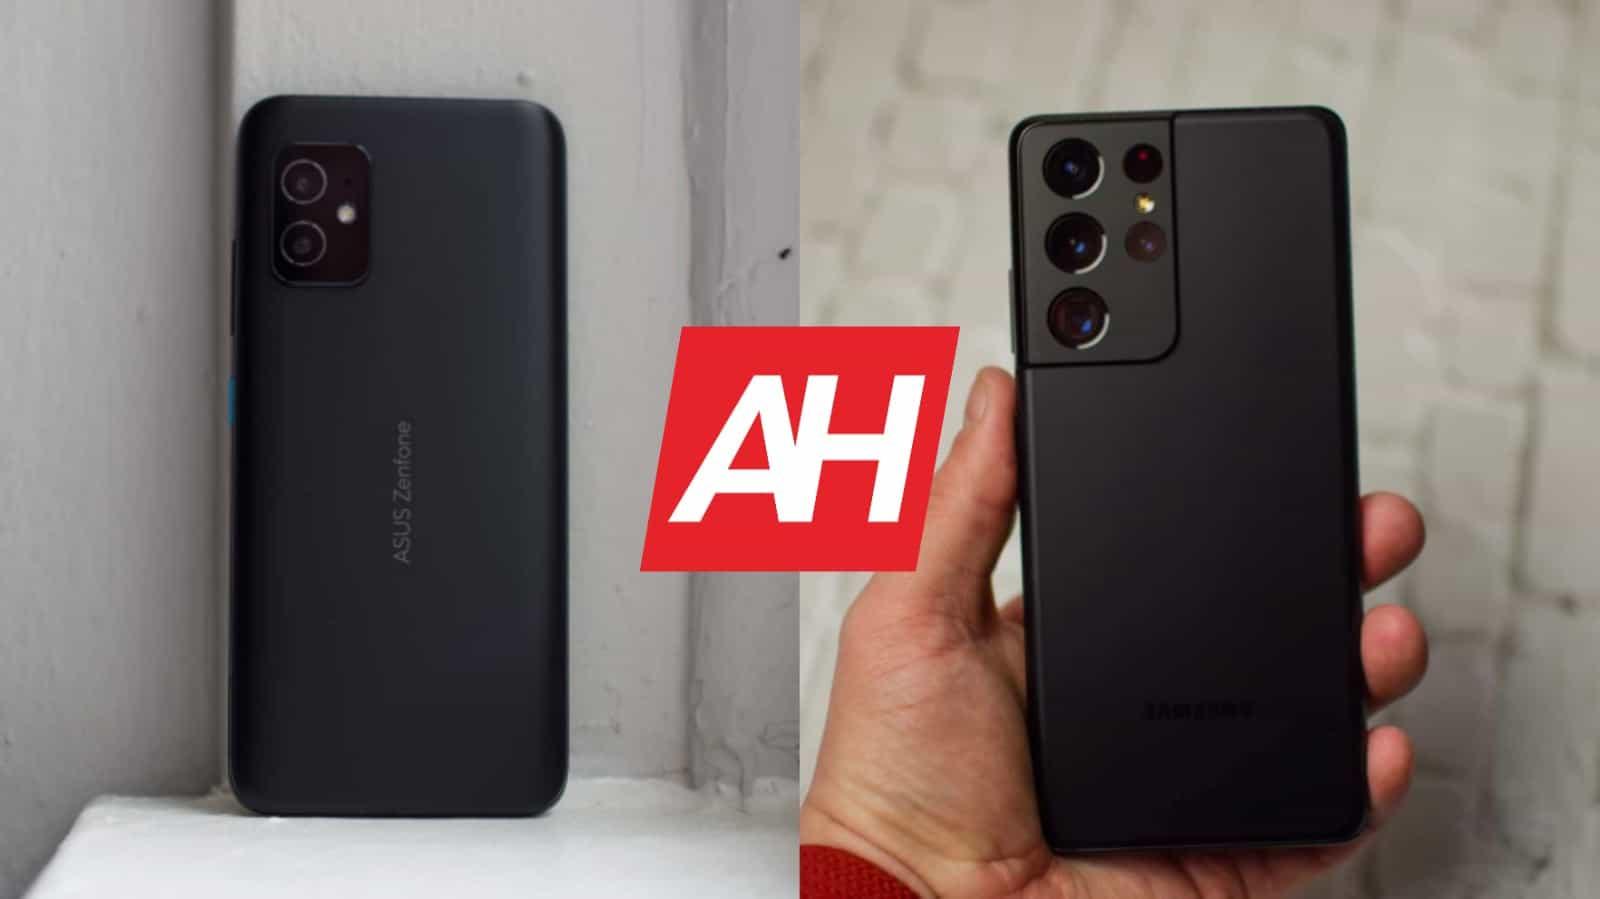 Phone Comparisons: ASUS ZenFone 8 vs Samsung Galaxy S21 Ultra